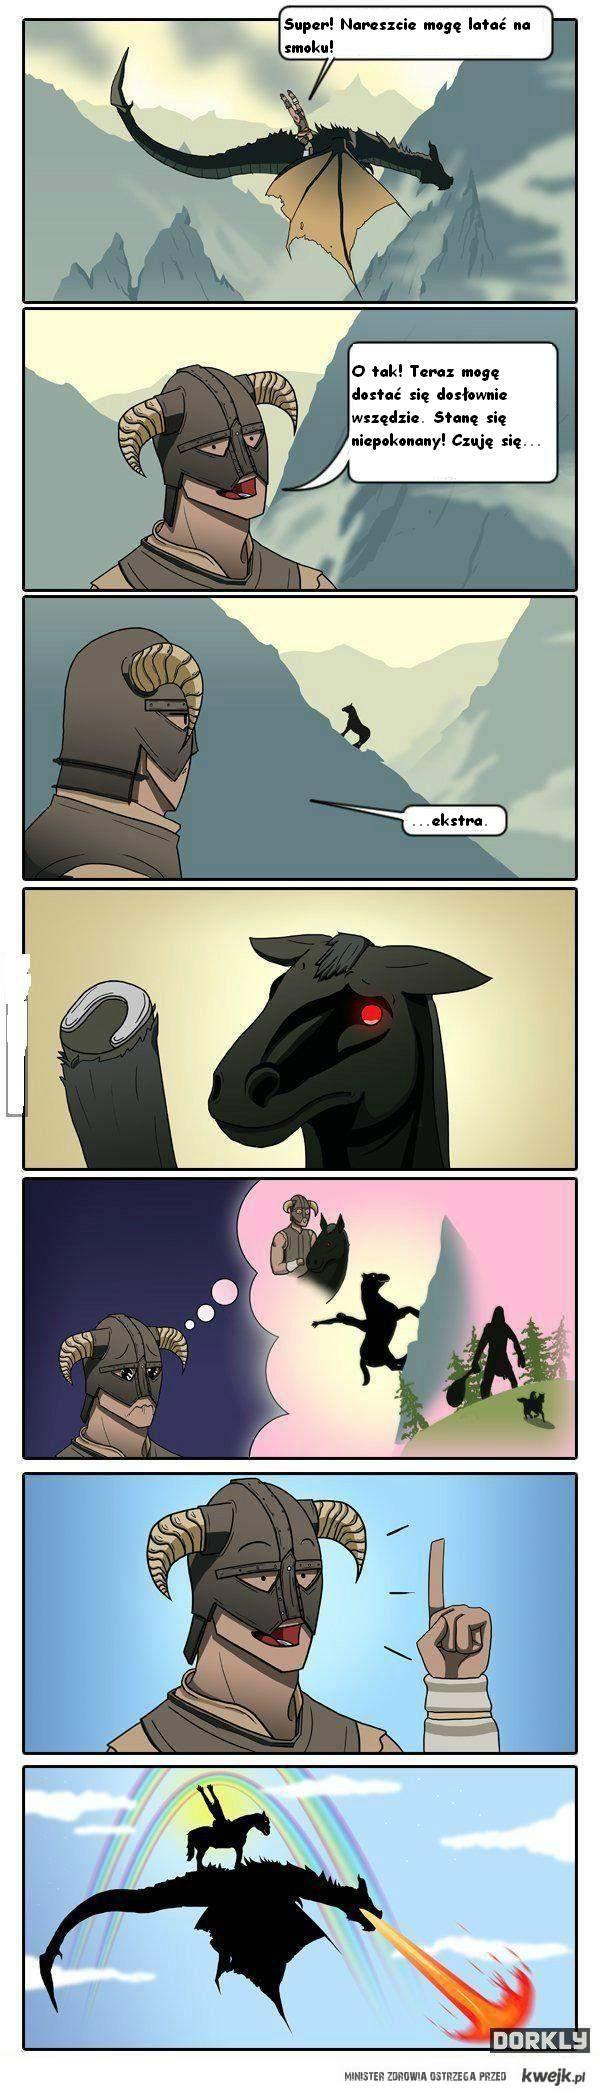 Smok i koń